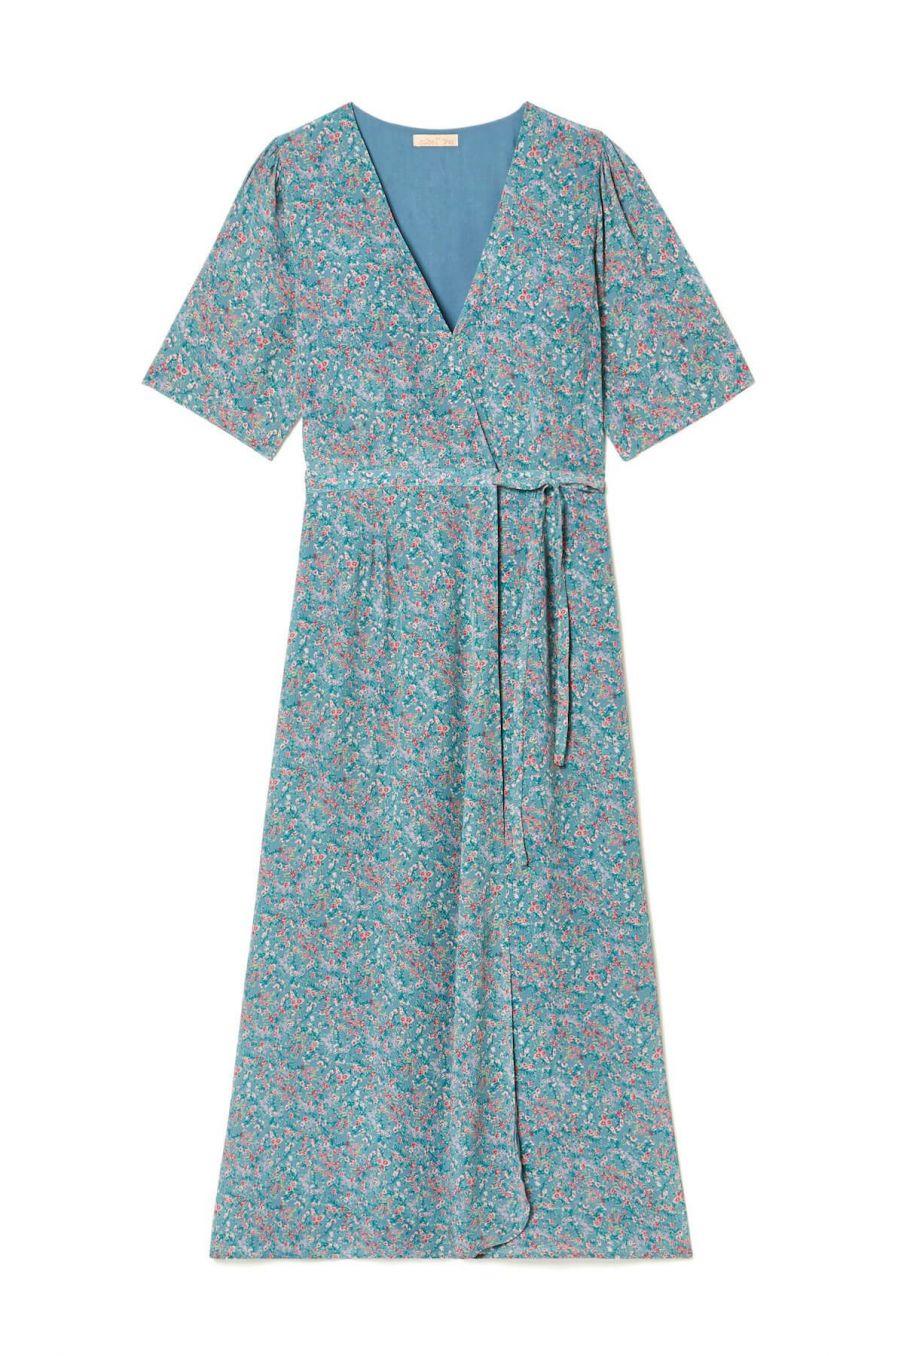 boheme chic vintage robe femme steria storm spring flowers